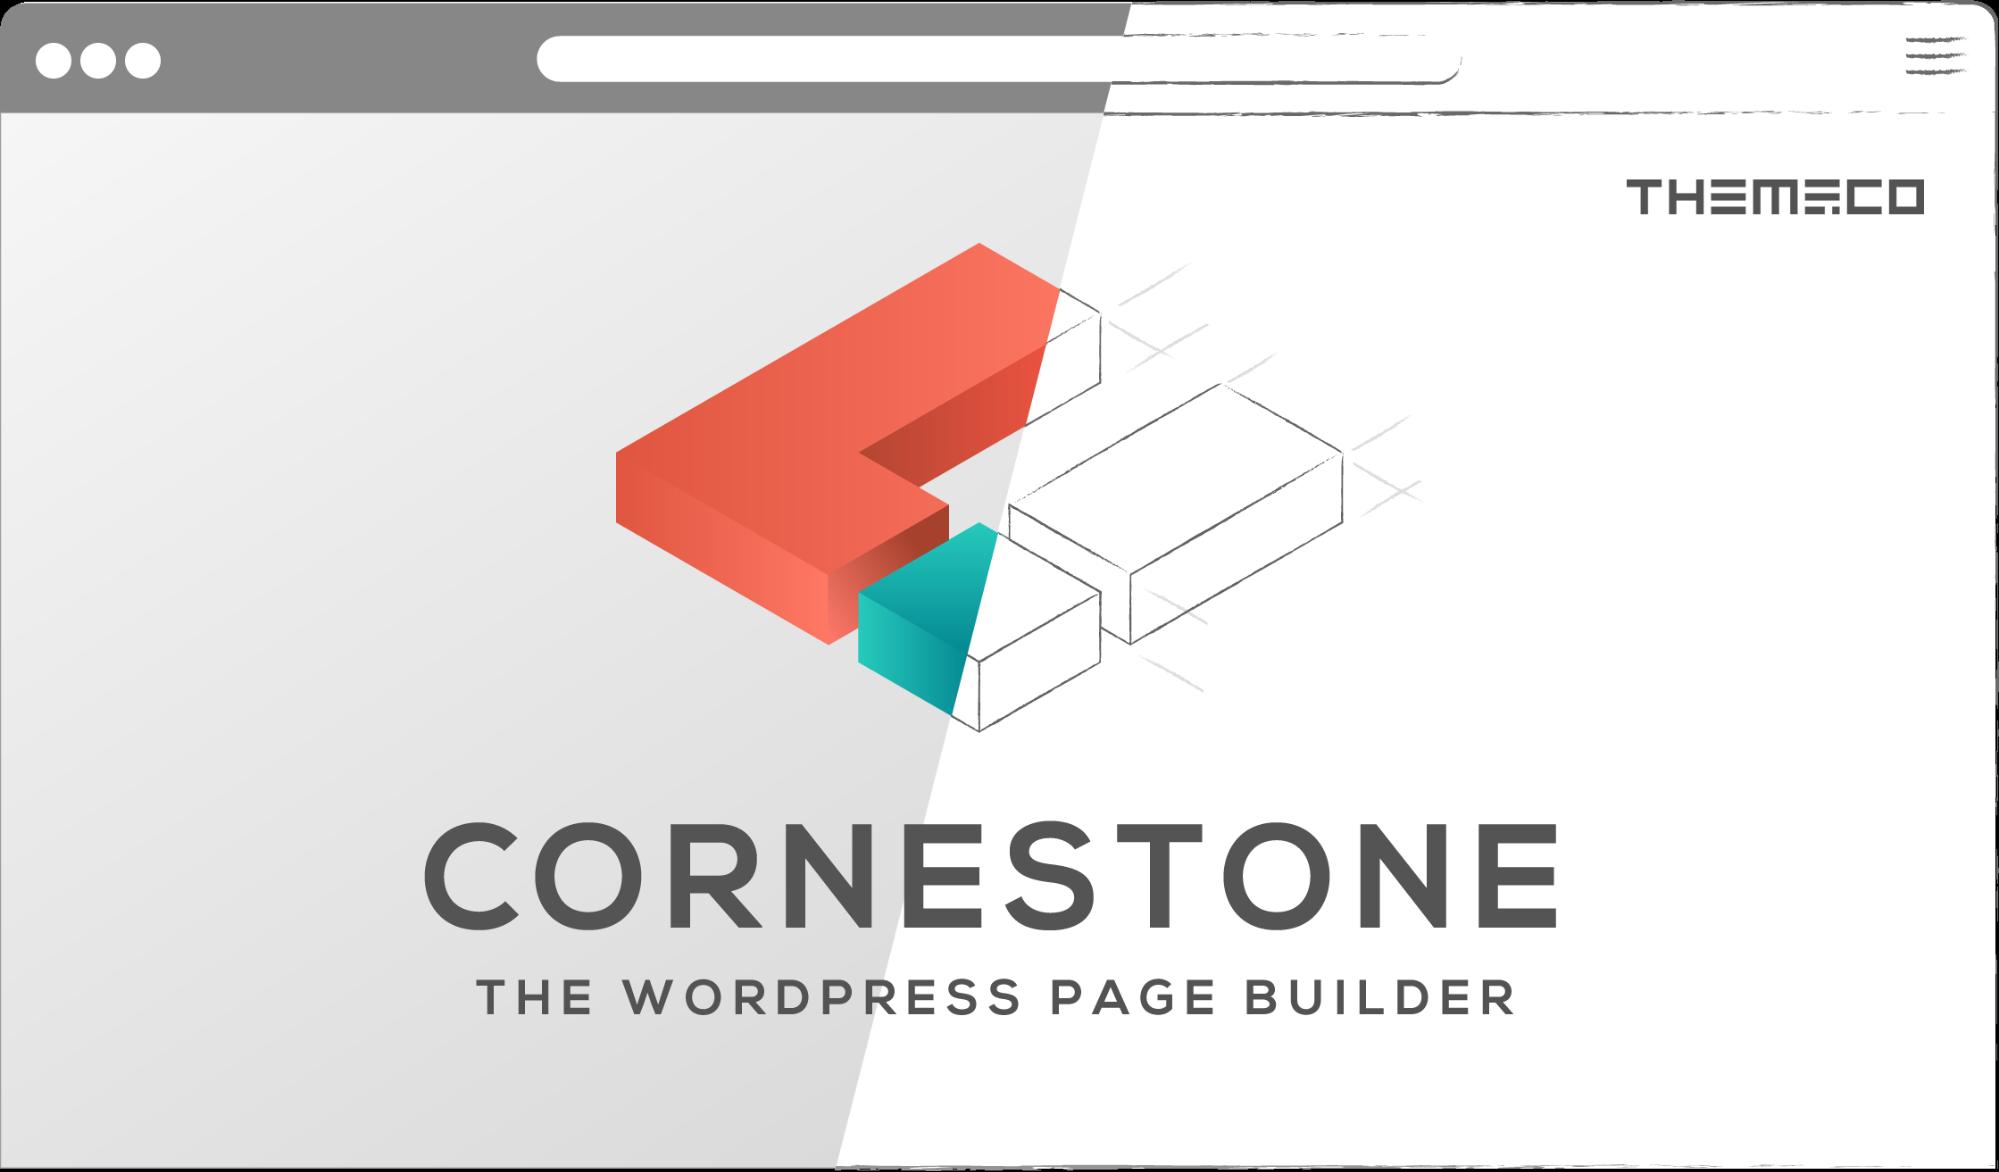 Themeco Cornerstone